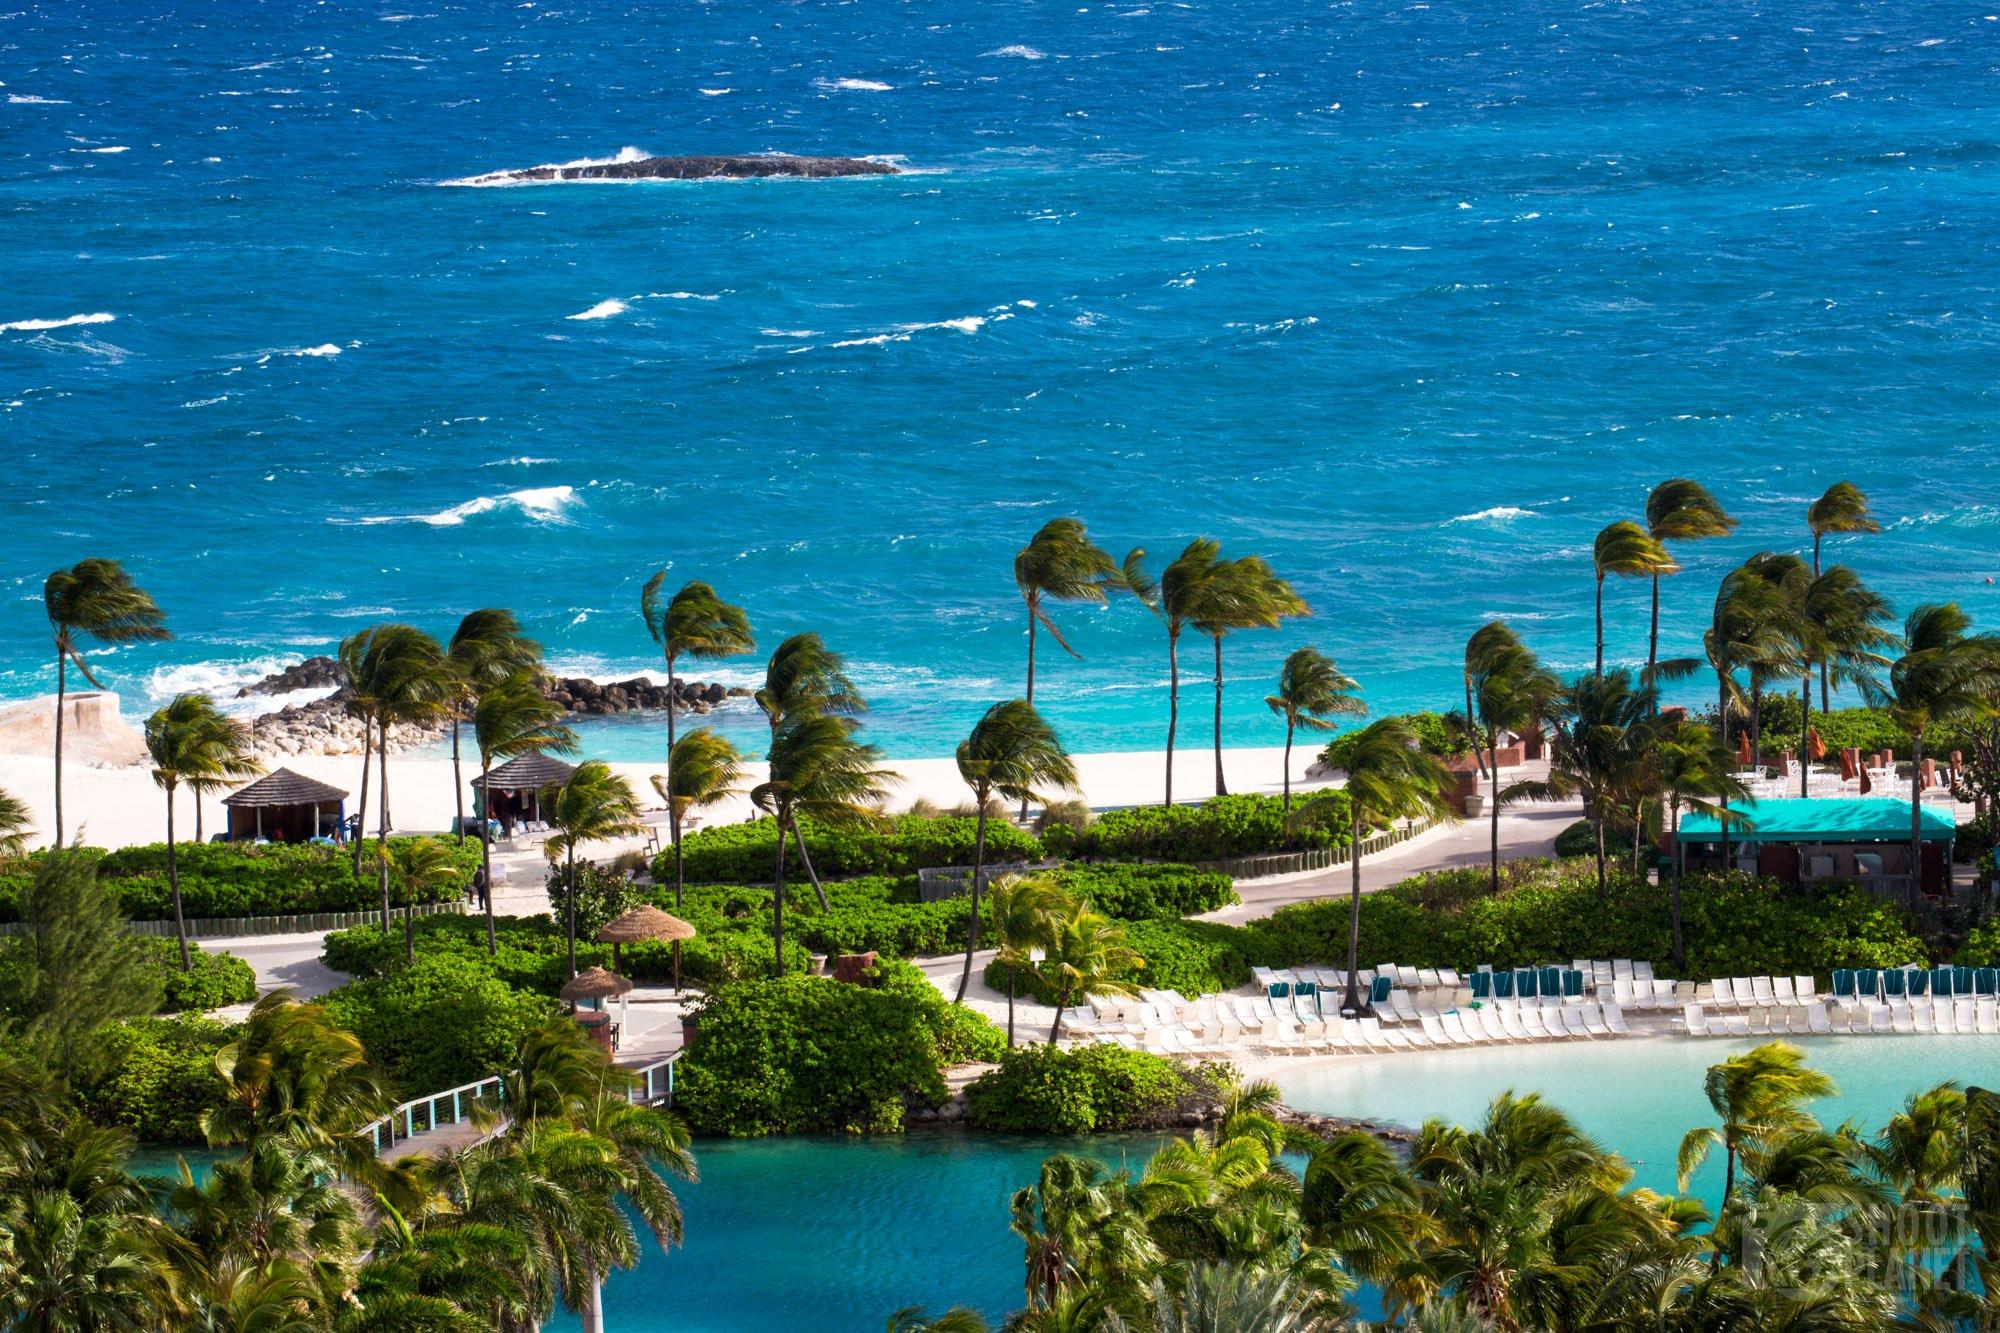 Pool and ocean view, Paradise island Bahamas